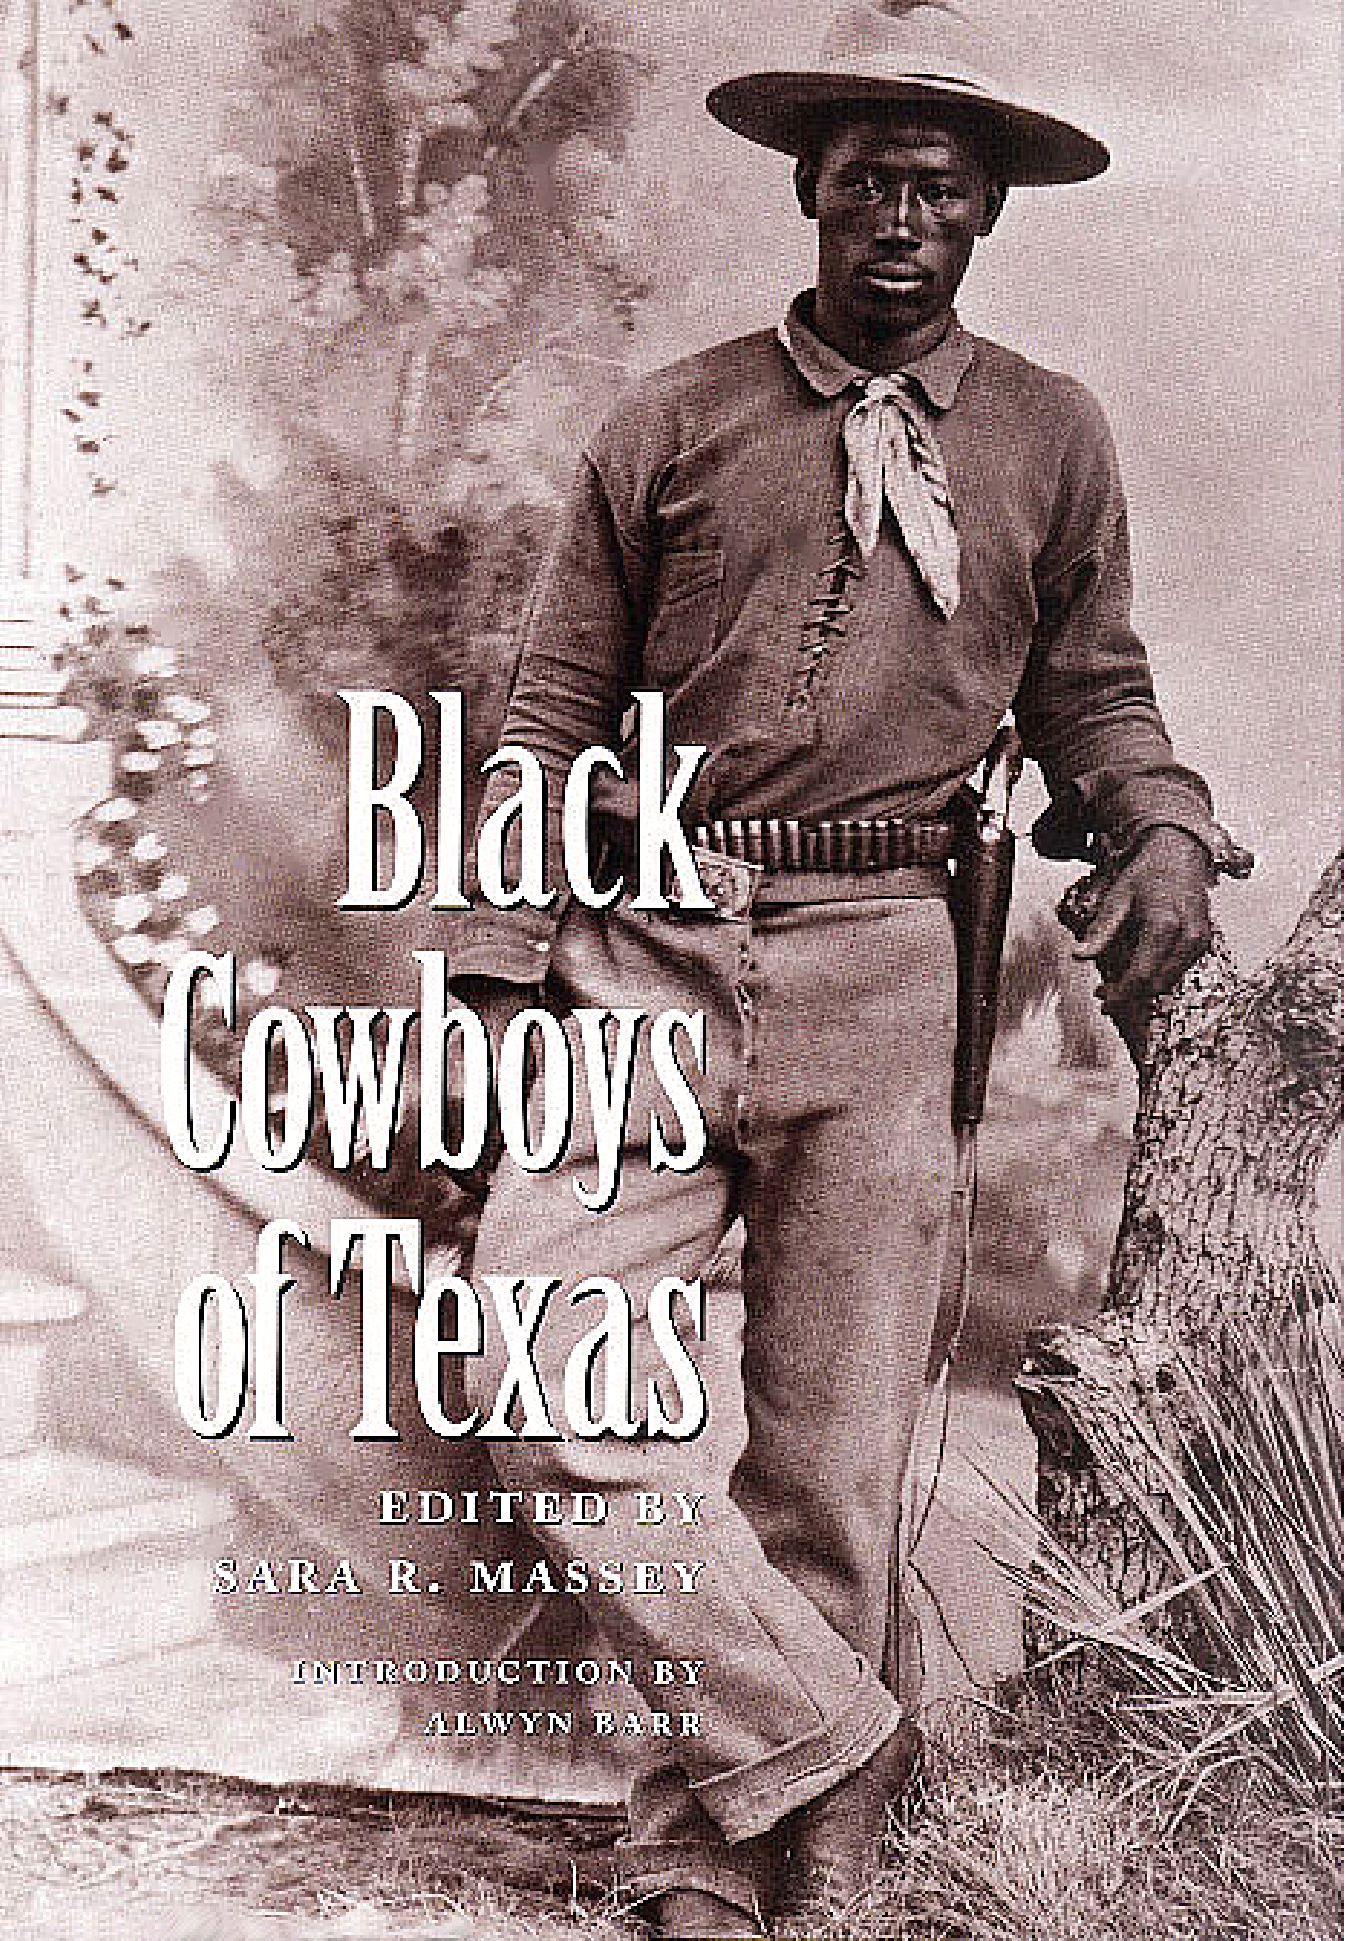 sinaloa cowboys analysis essay